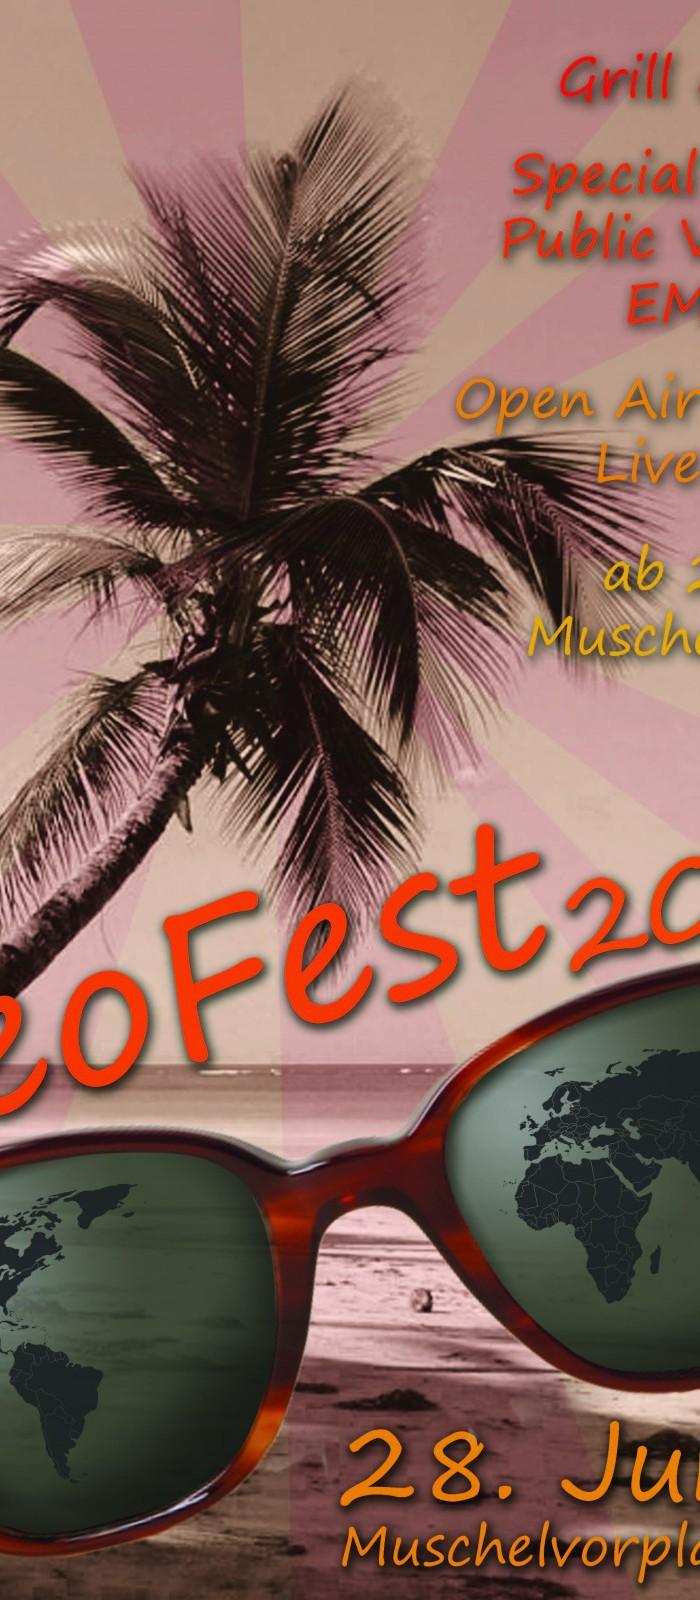 GeoFest Plakat 2012